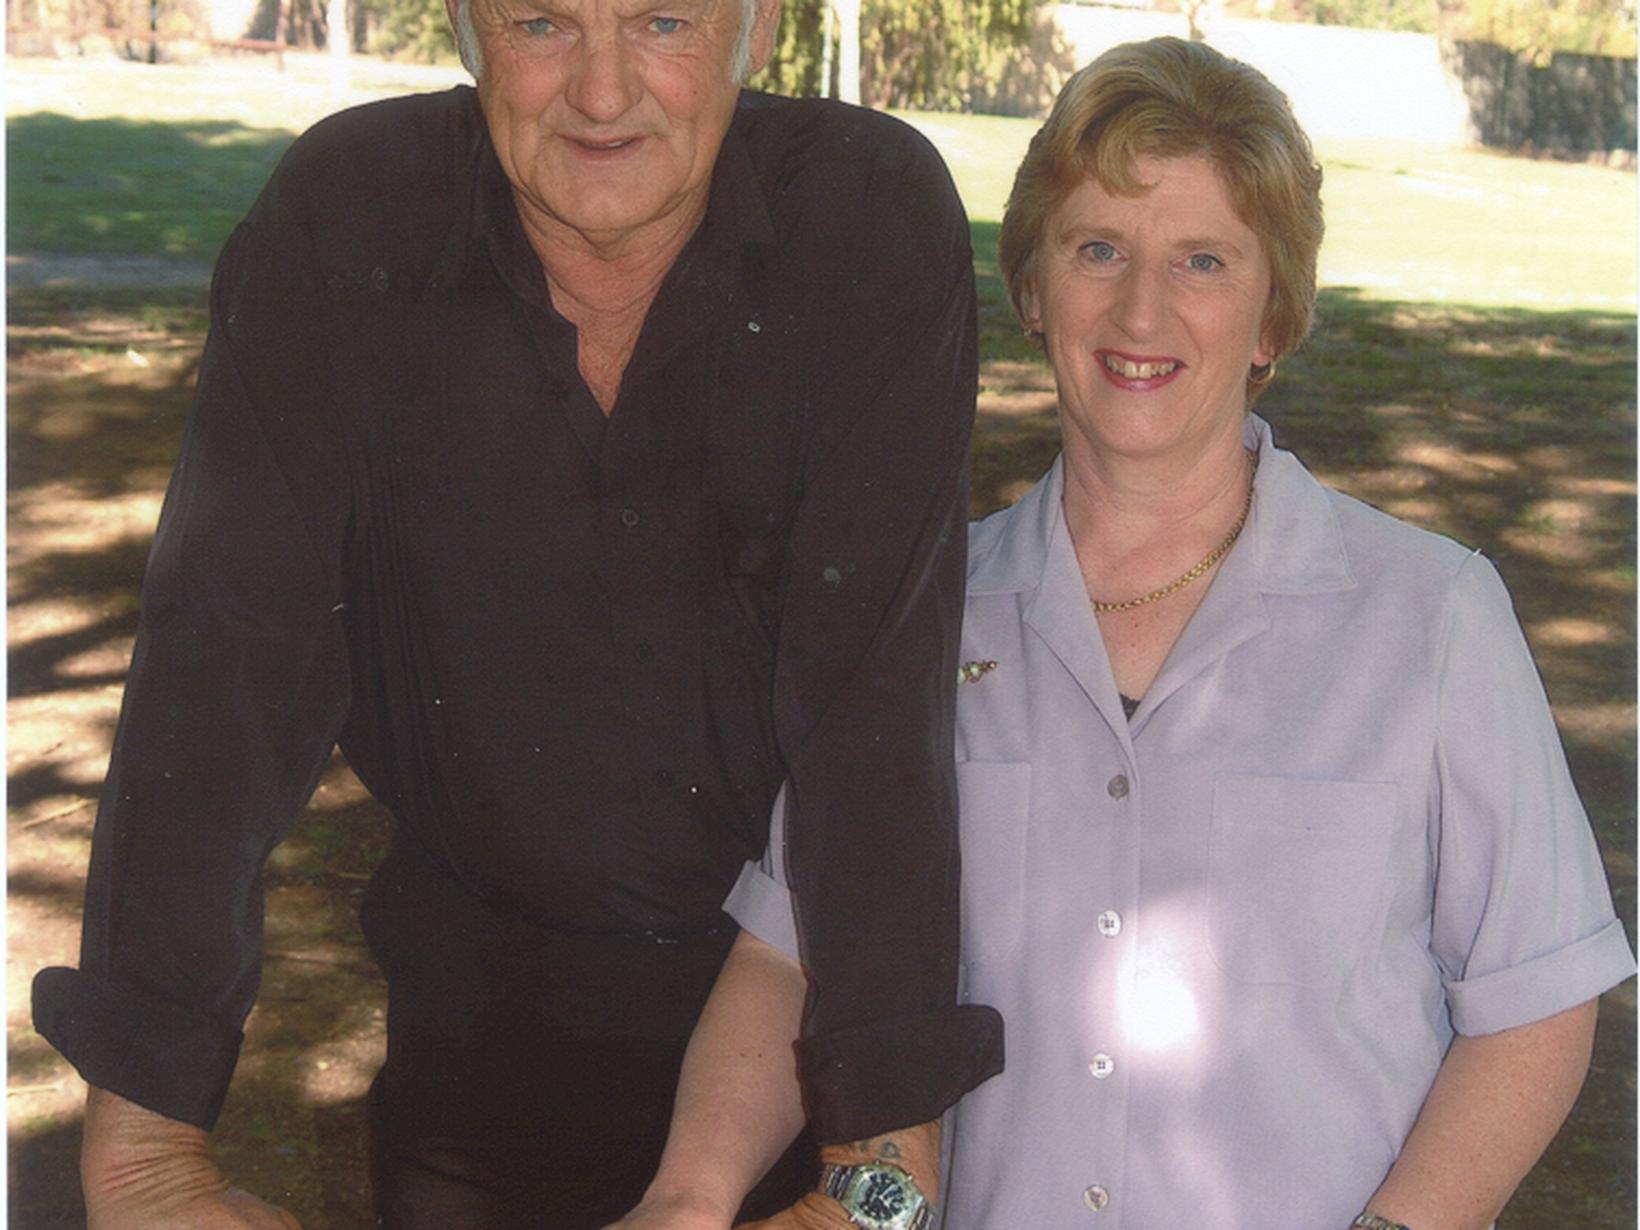 Irene & Bruce from Corowa, New South Wales, Australia